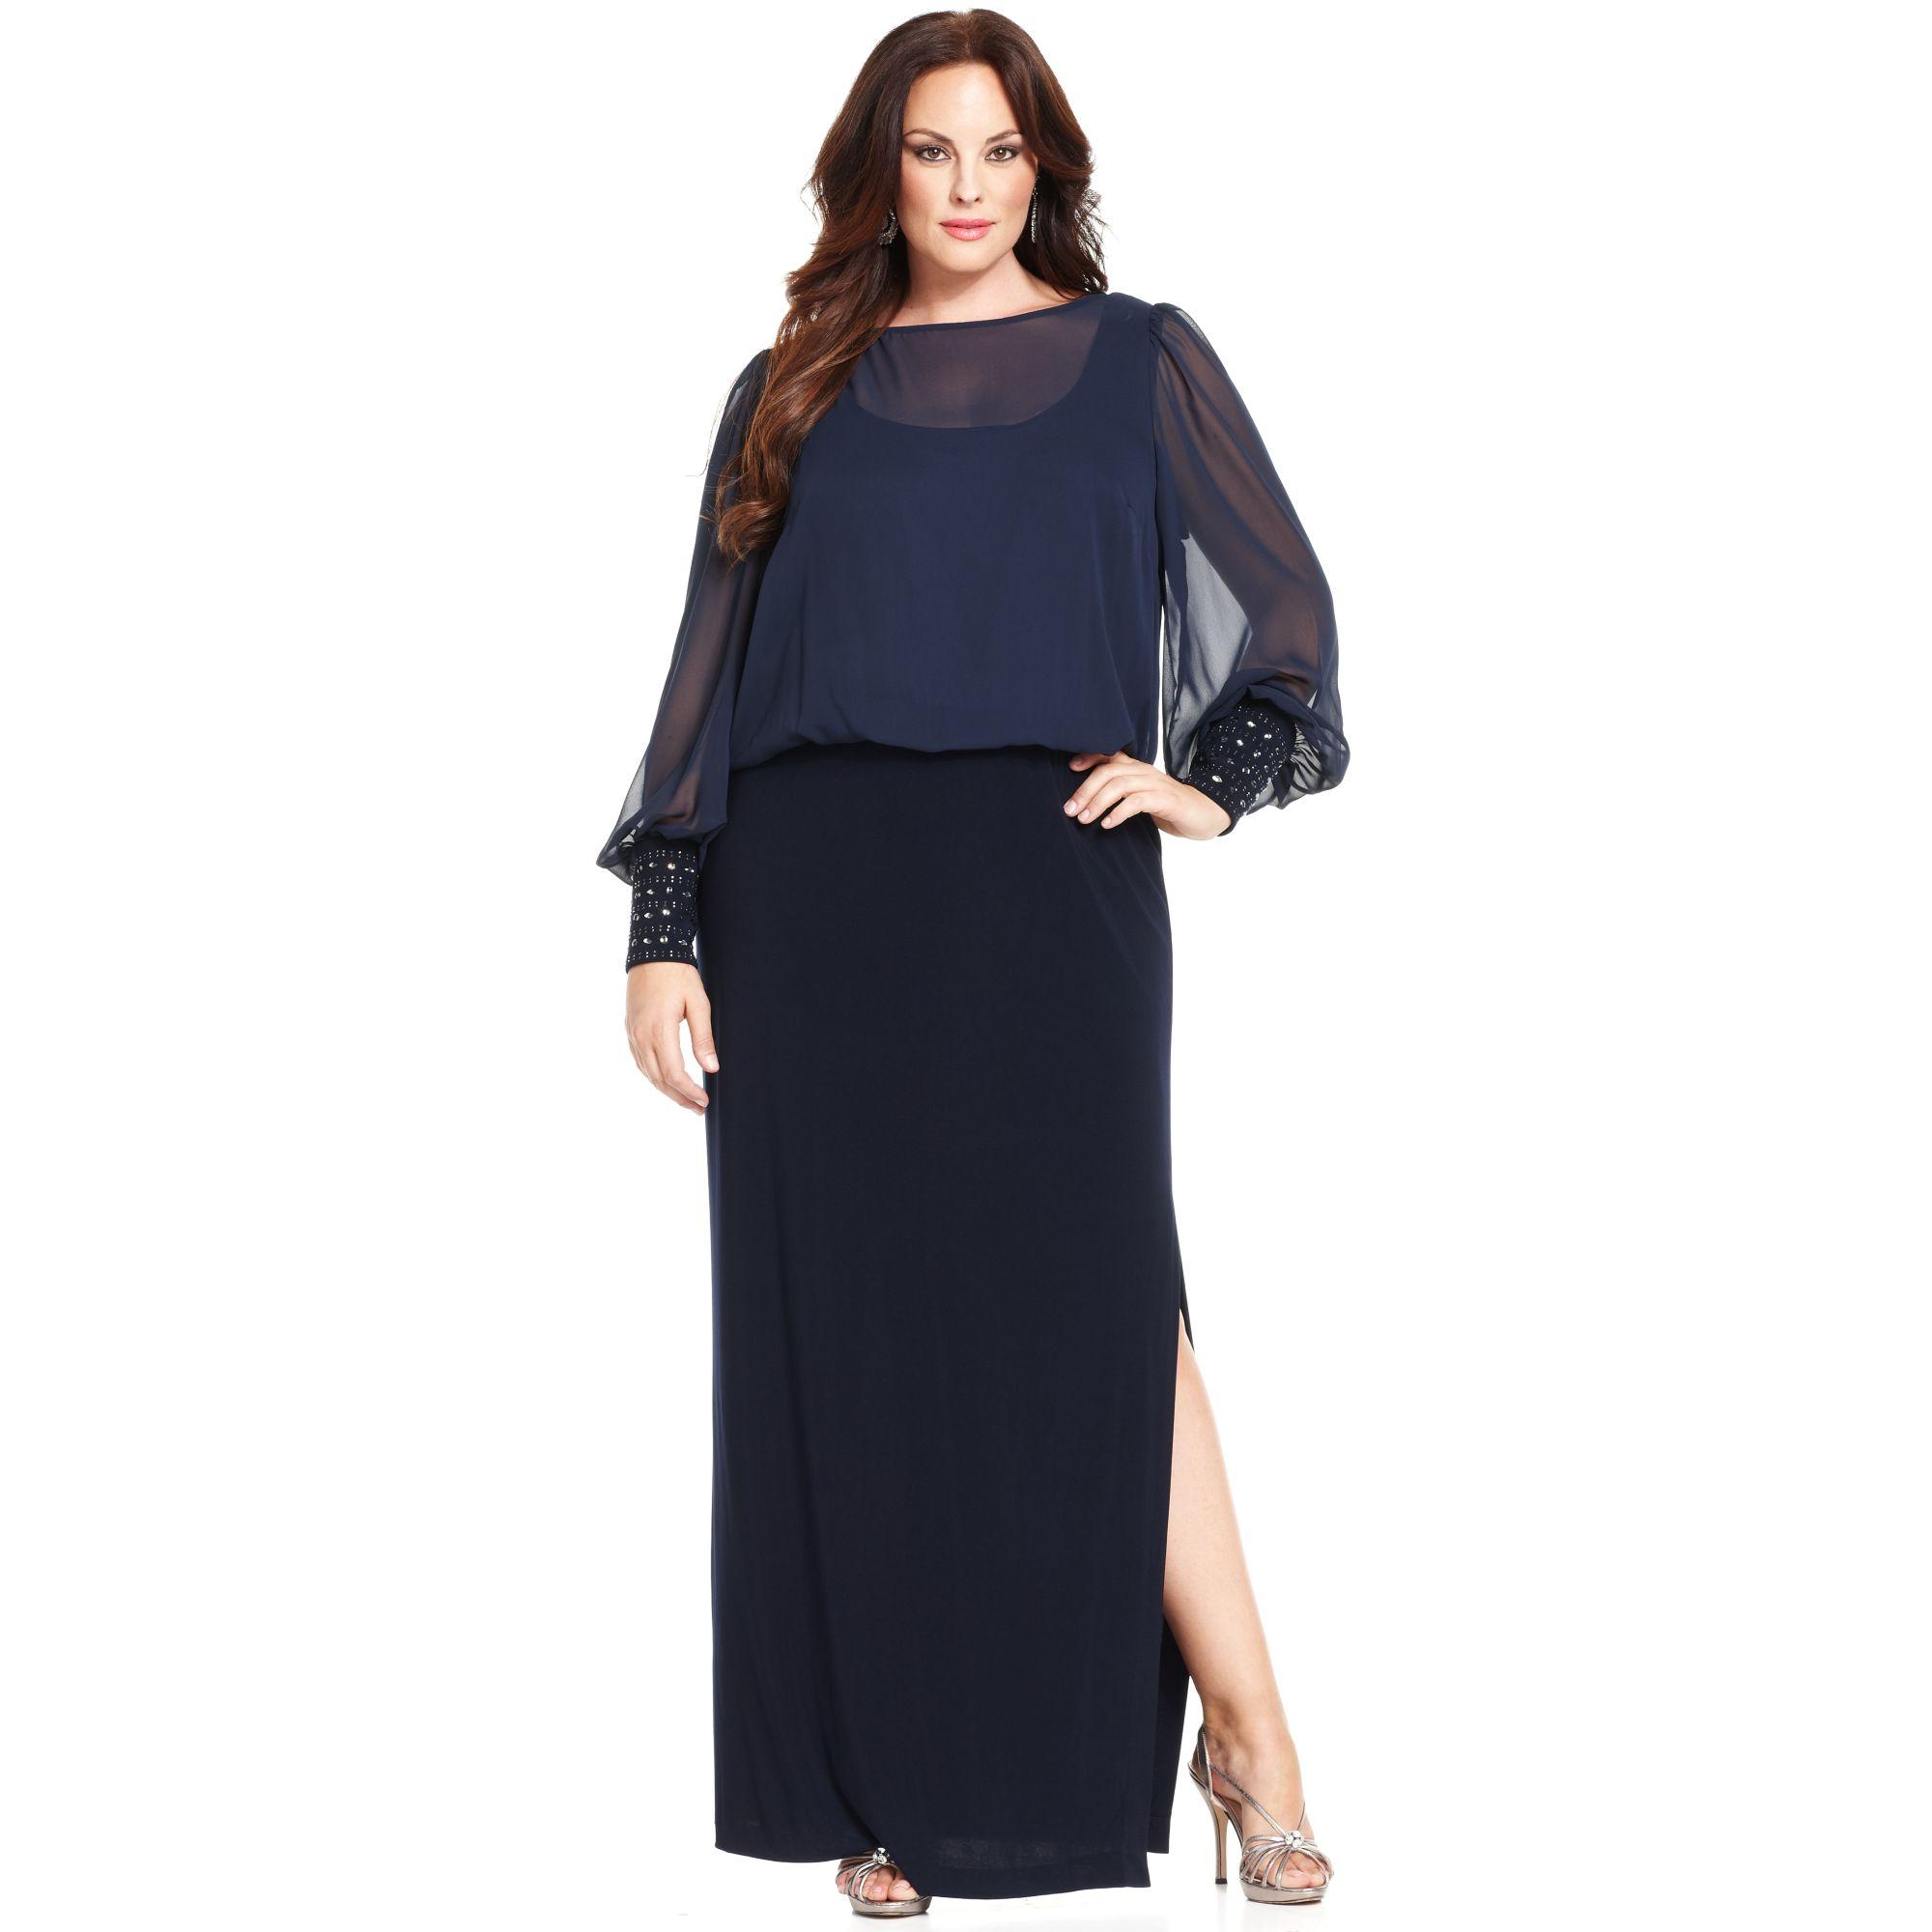 Xscape Blue Plus Size Dress Longsleeve Blouson Gown